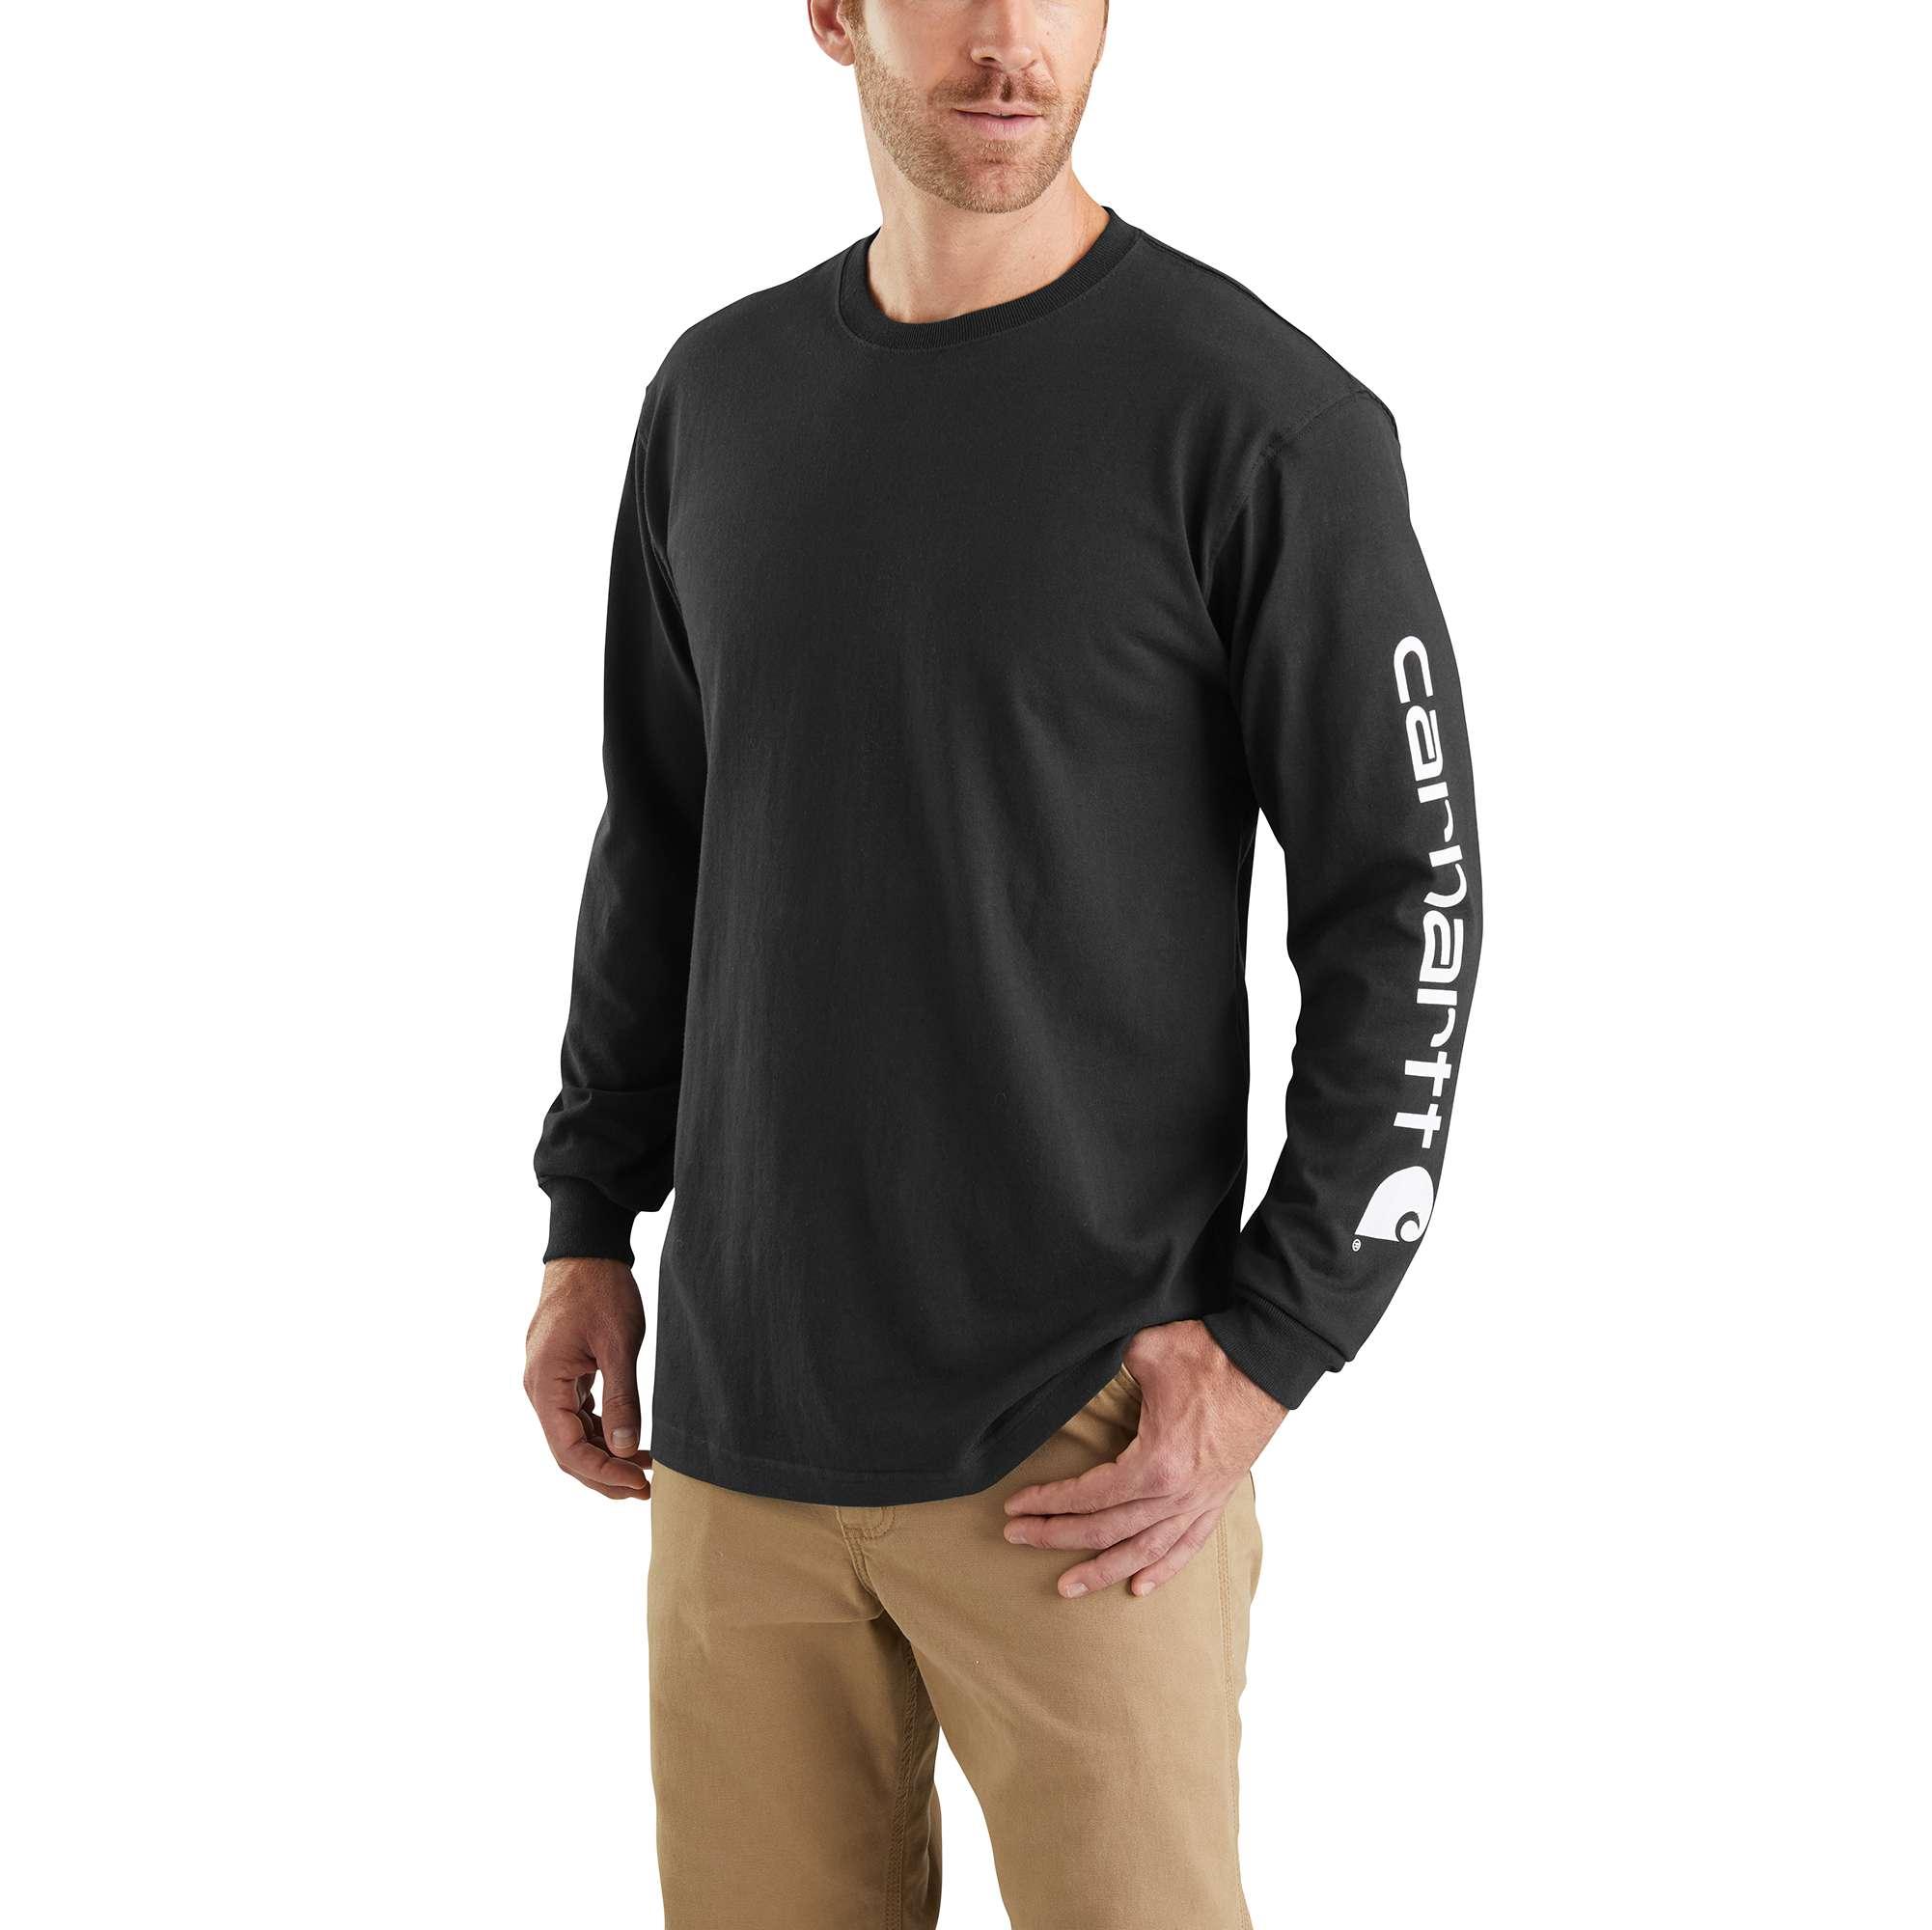 Men's Big & Tall Signature-Sleeve Logo Long-Sleeve T-Shirt, Black, swatch